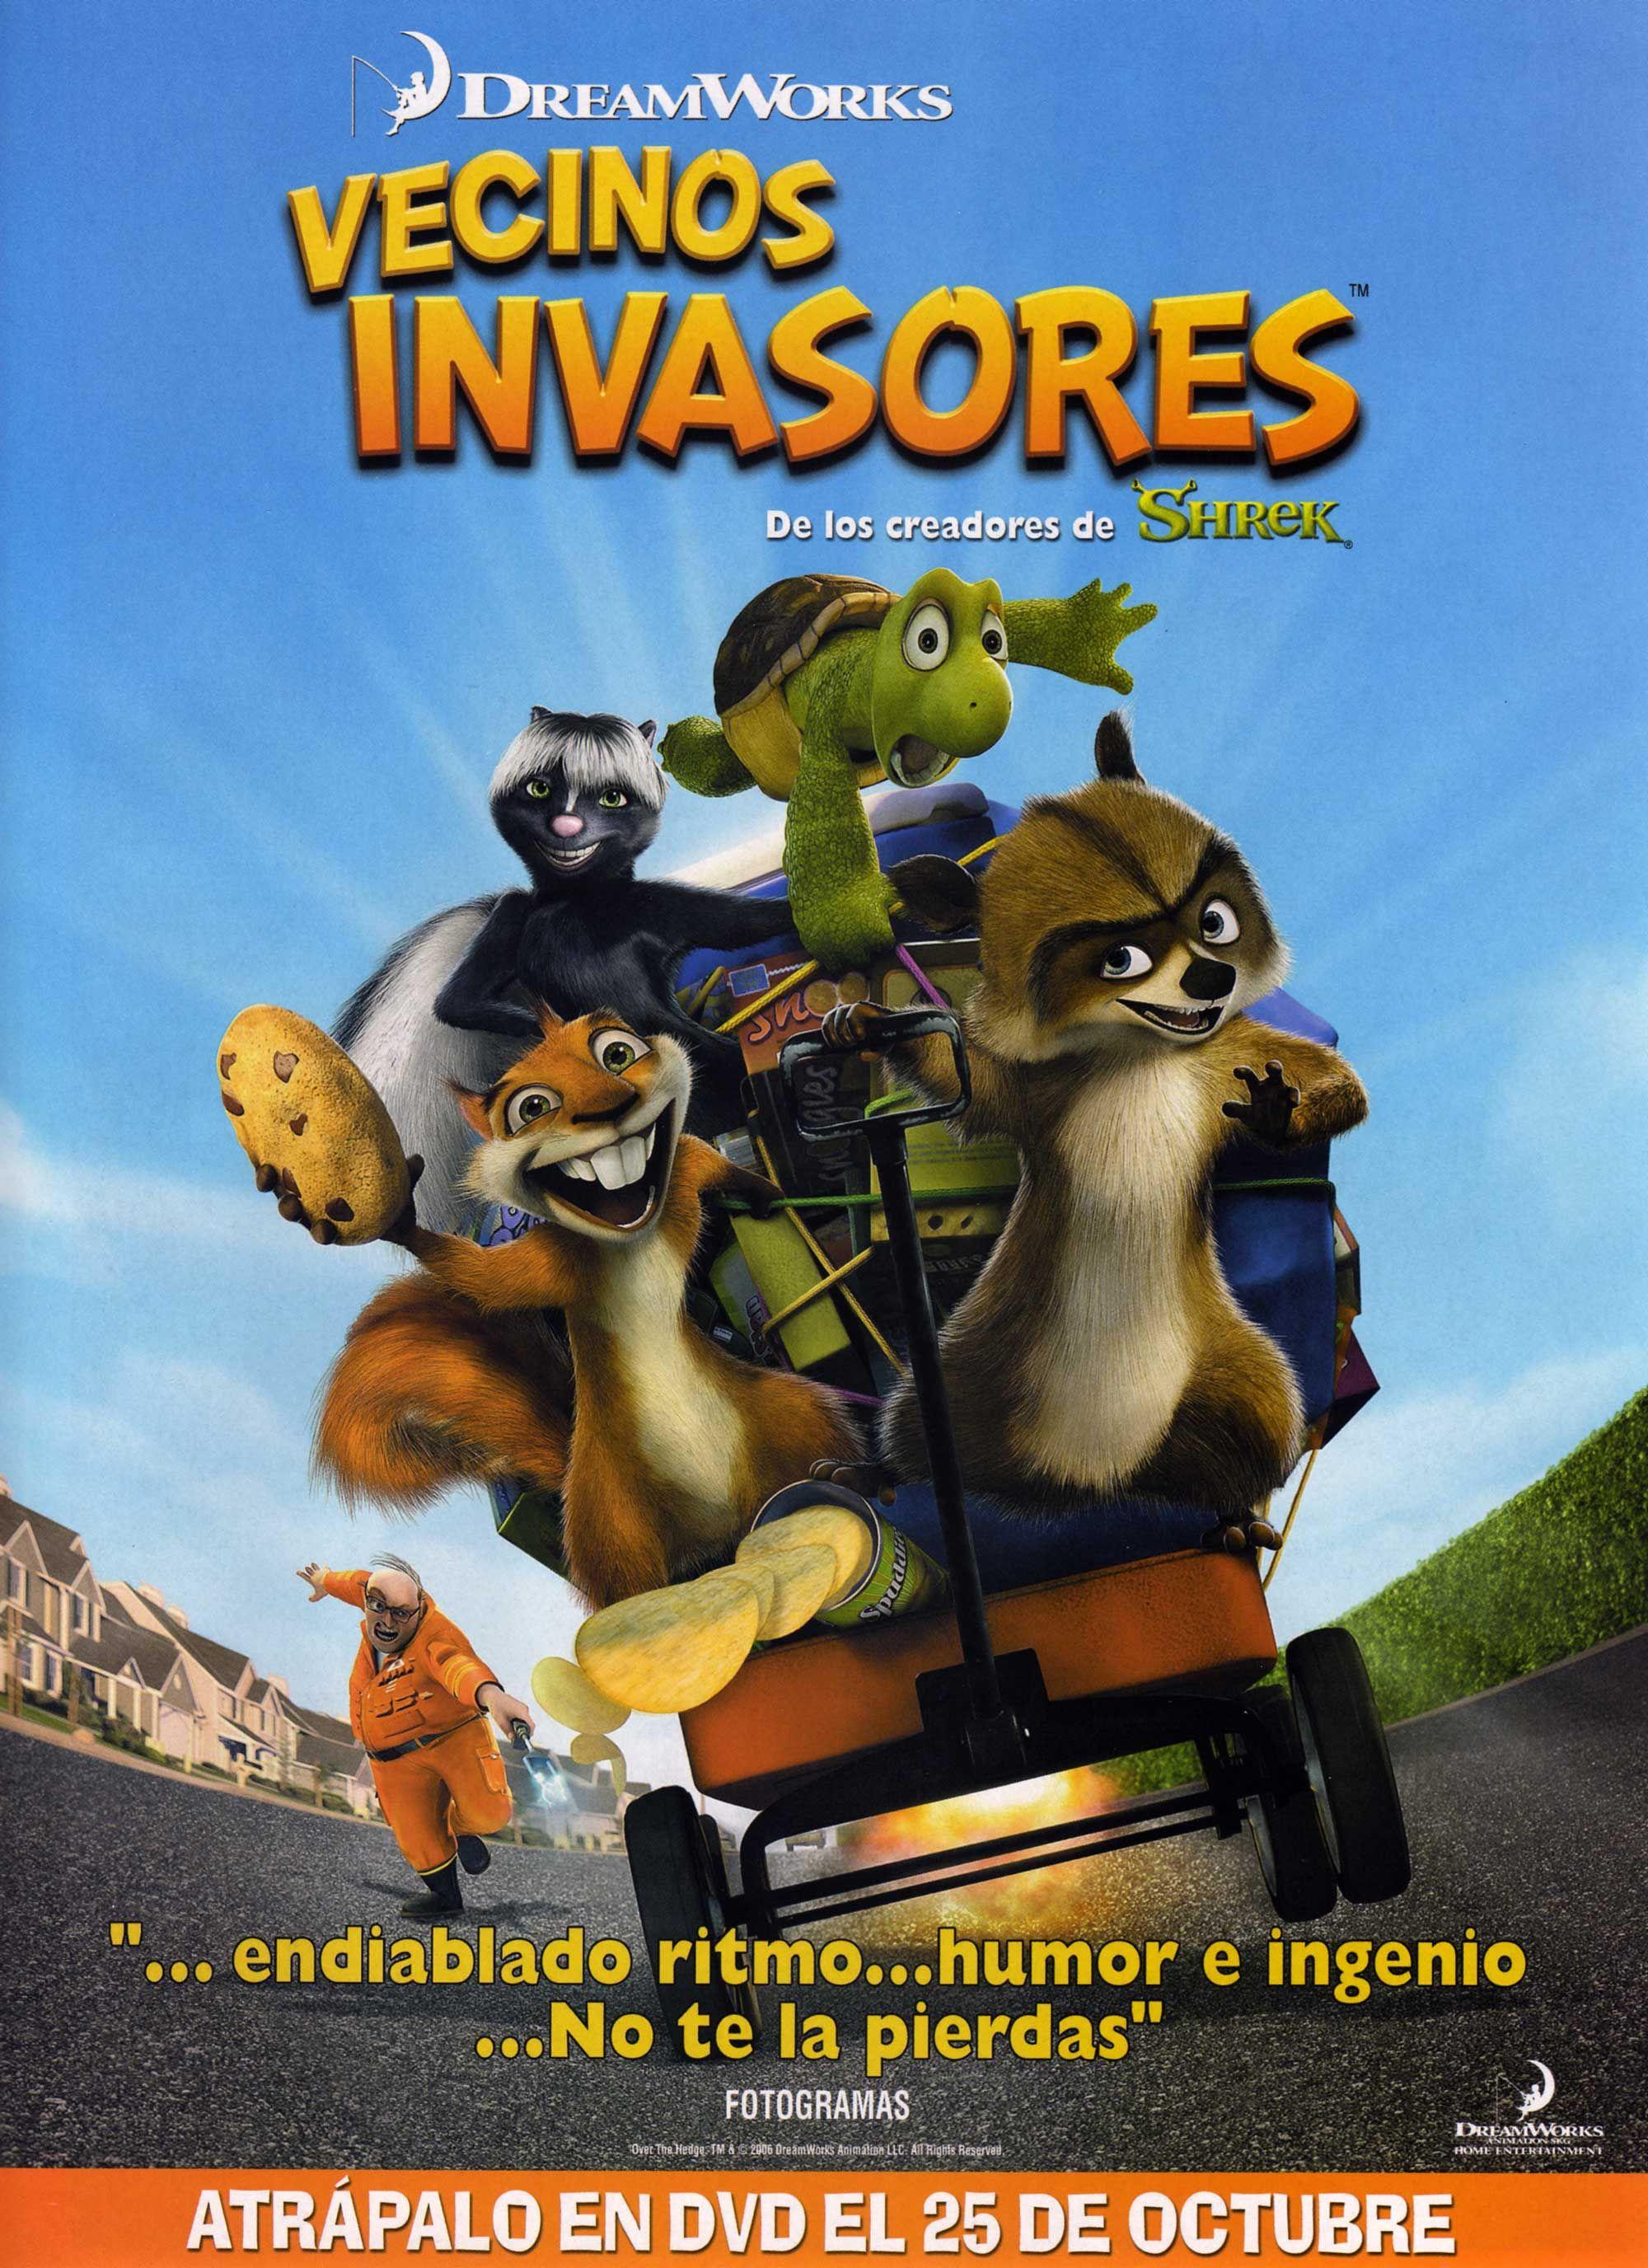 Vecinos Invasores Full Movies Online Free Full Movies Full Movies Online